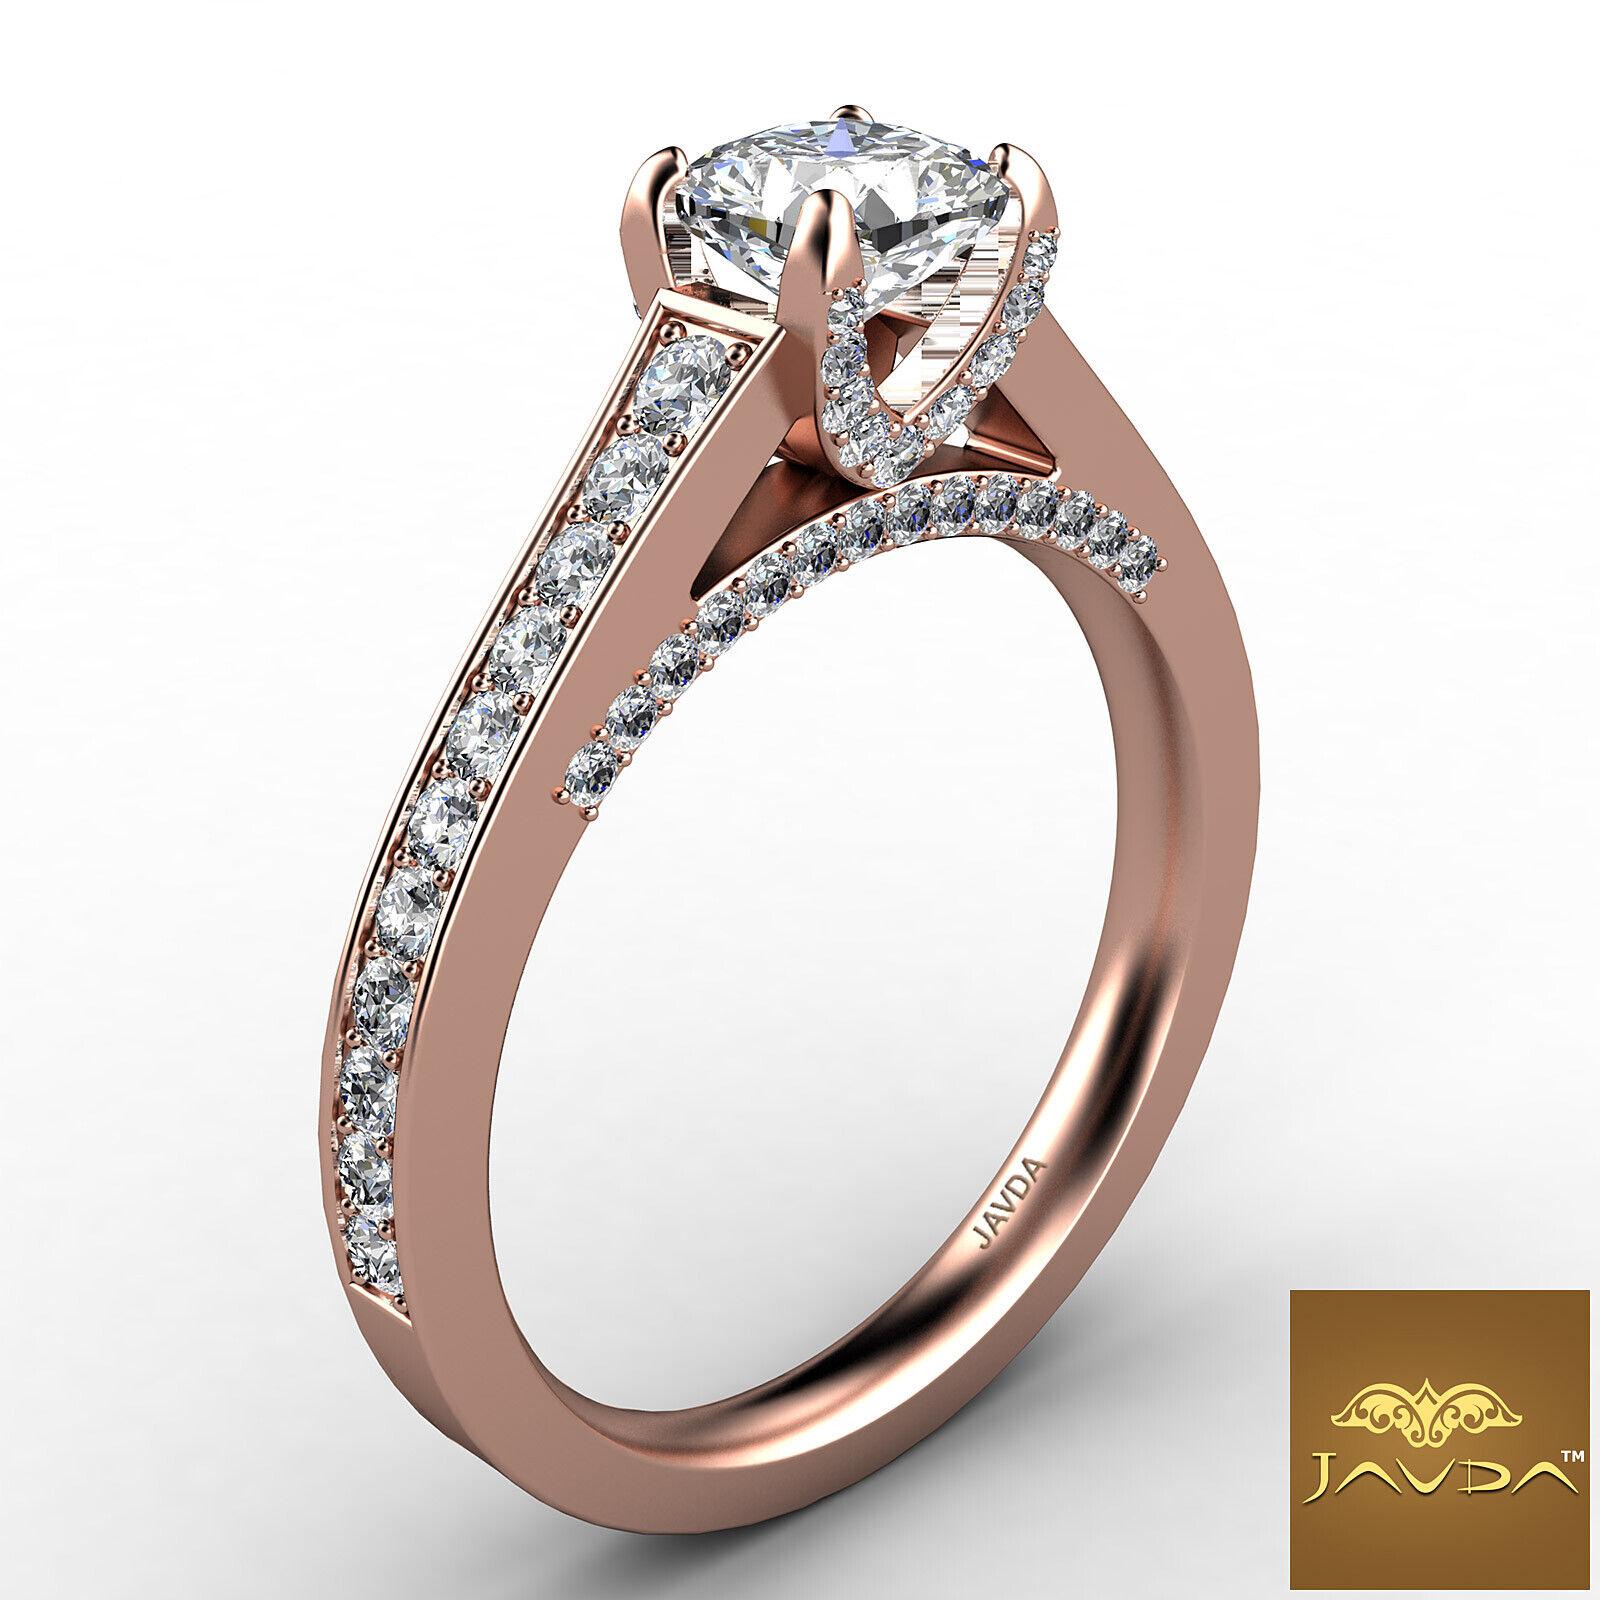 Cushion Cut Diamond Flawless Engagement GIA G VVS2 Pave Set Ring Platinum 1.25Ct 10